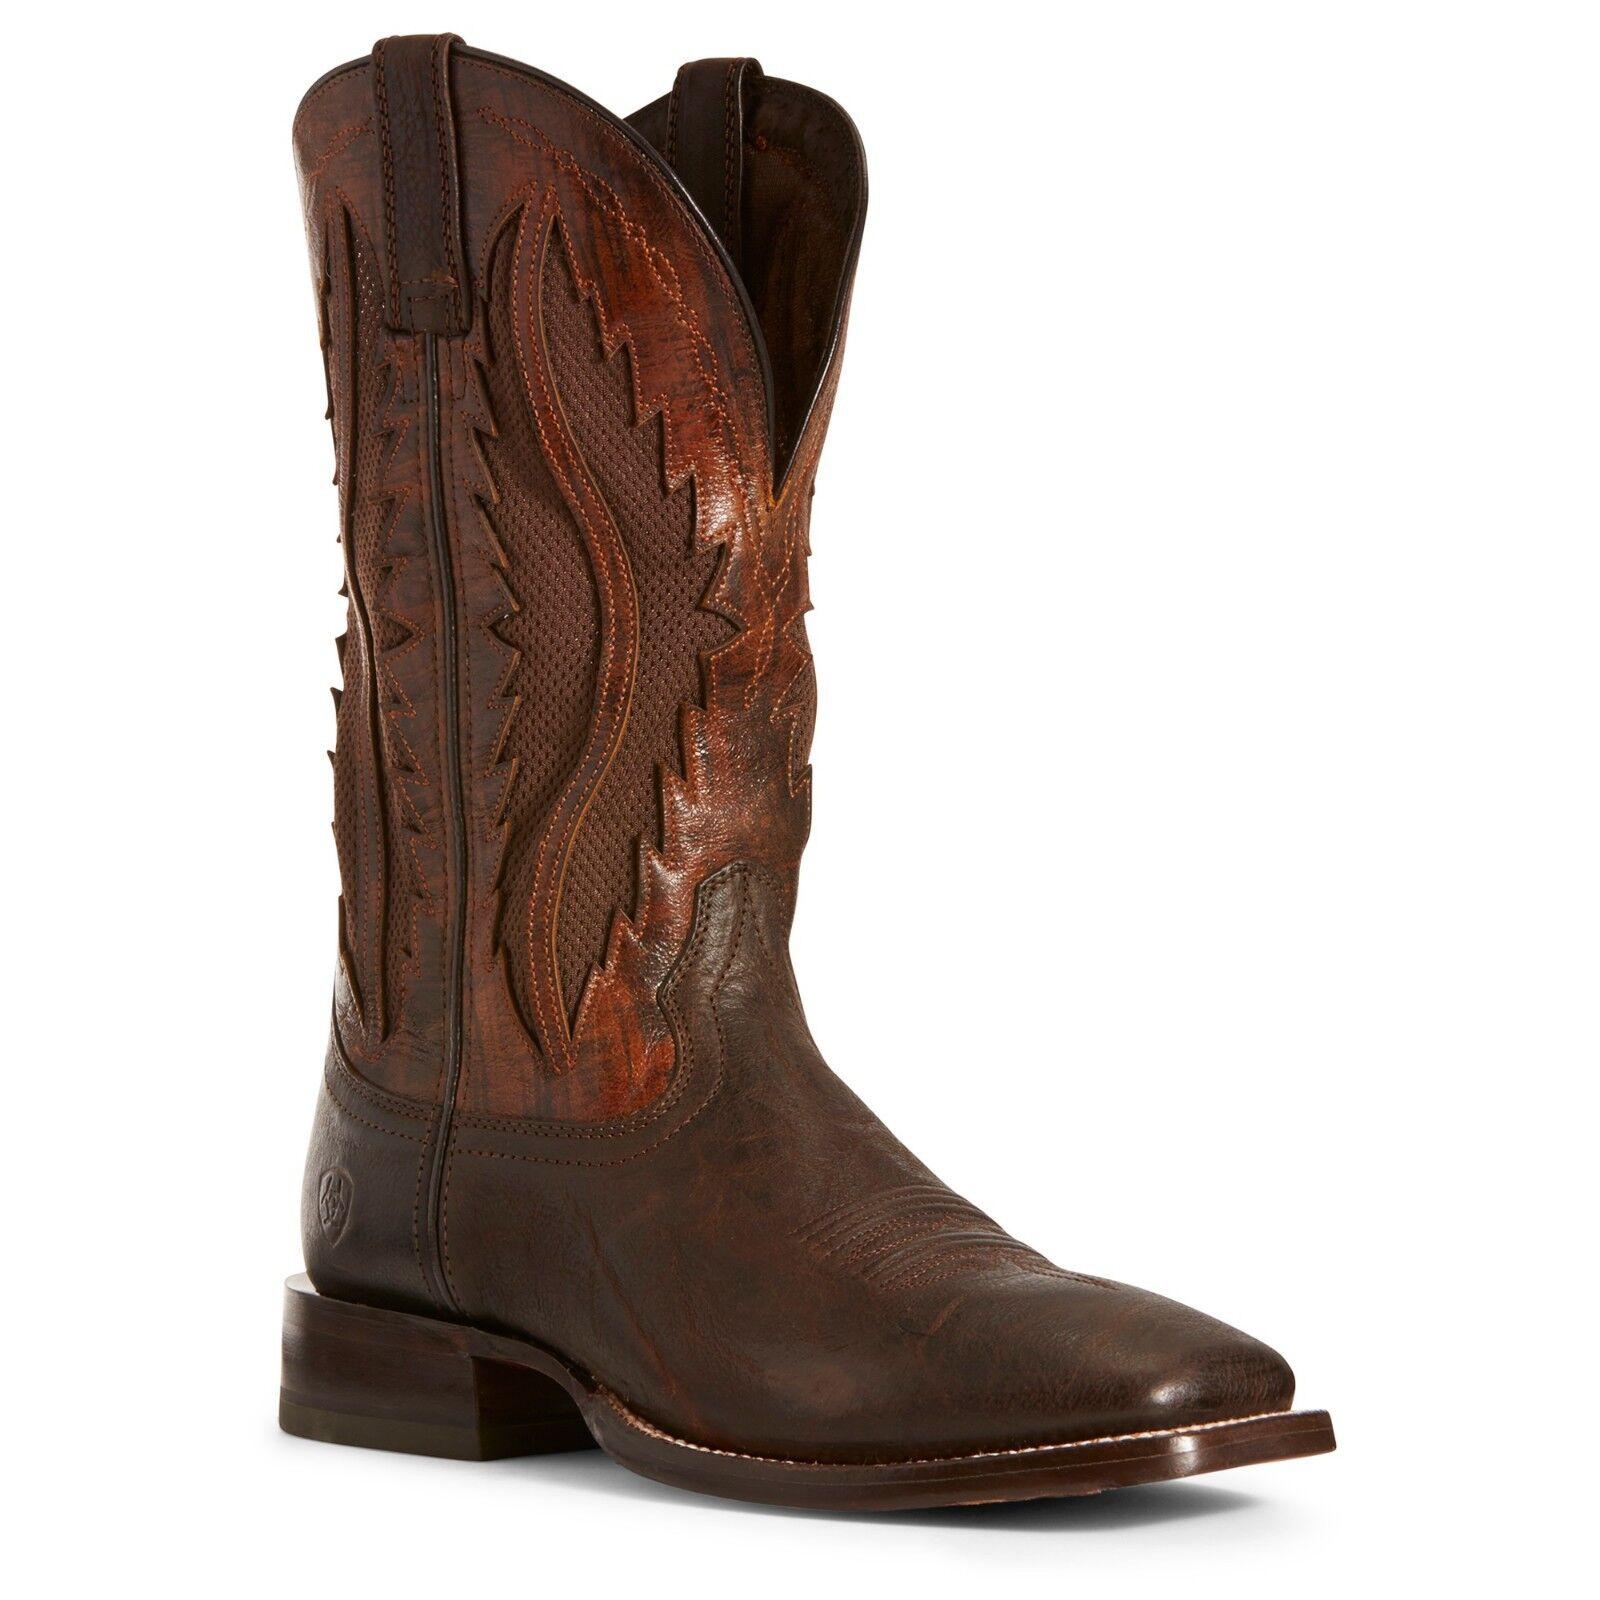 Ariat® Men's Traditional VentTEK® Tobacco Bay Sienna Boots 10027170